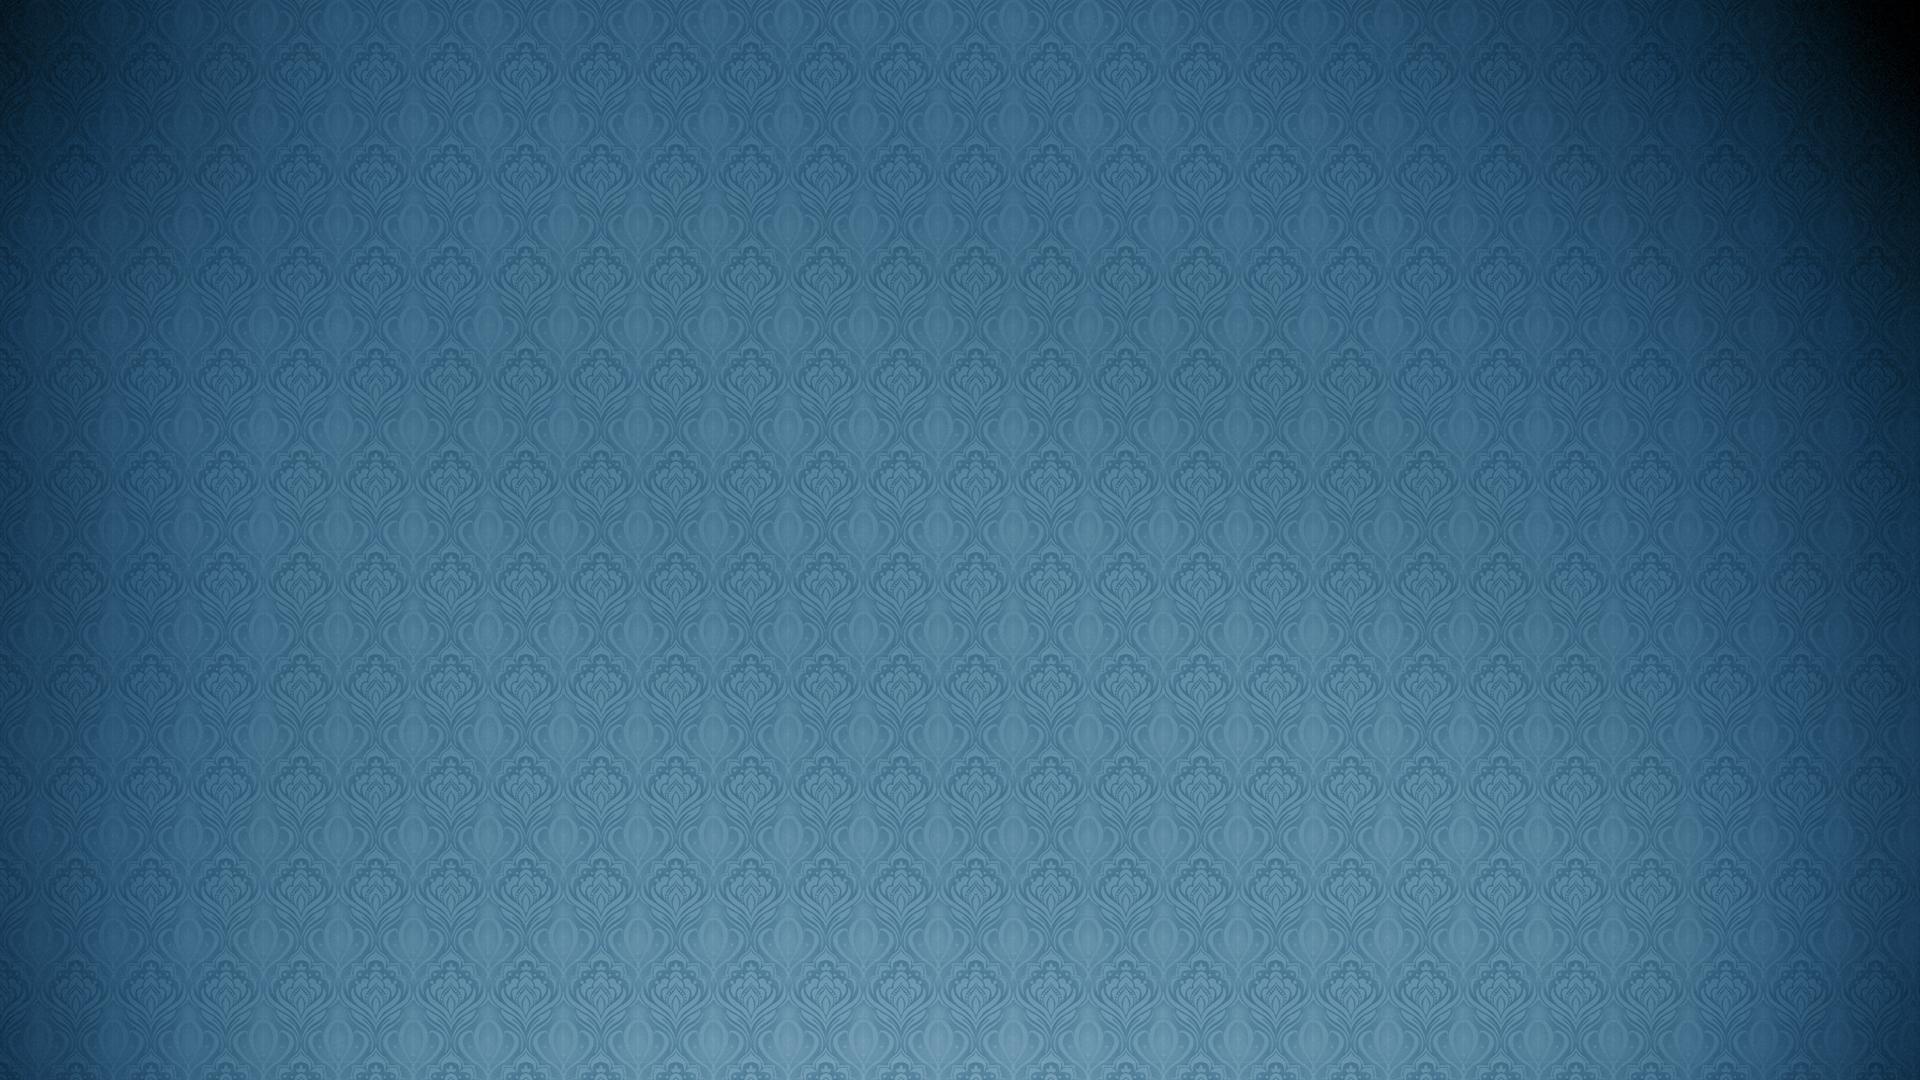 Download 'simple pattern wallpaper' HD wallpaper